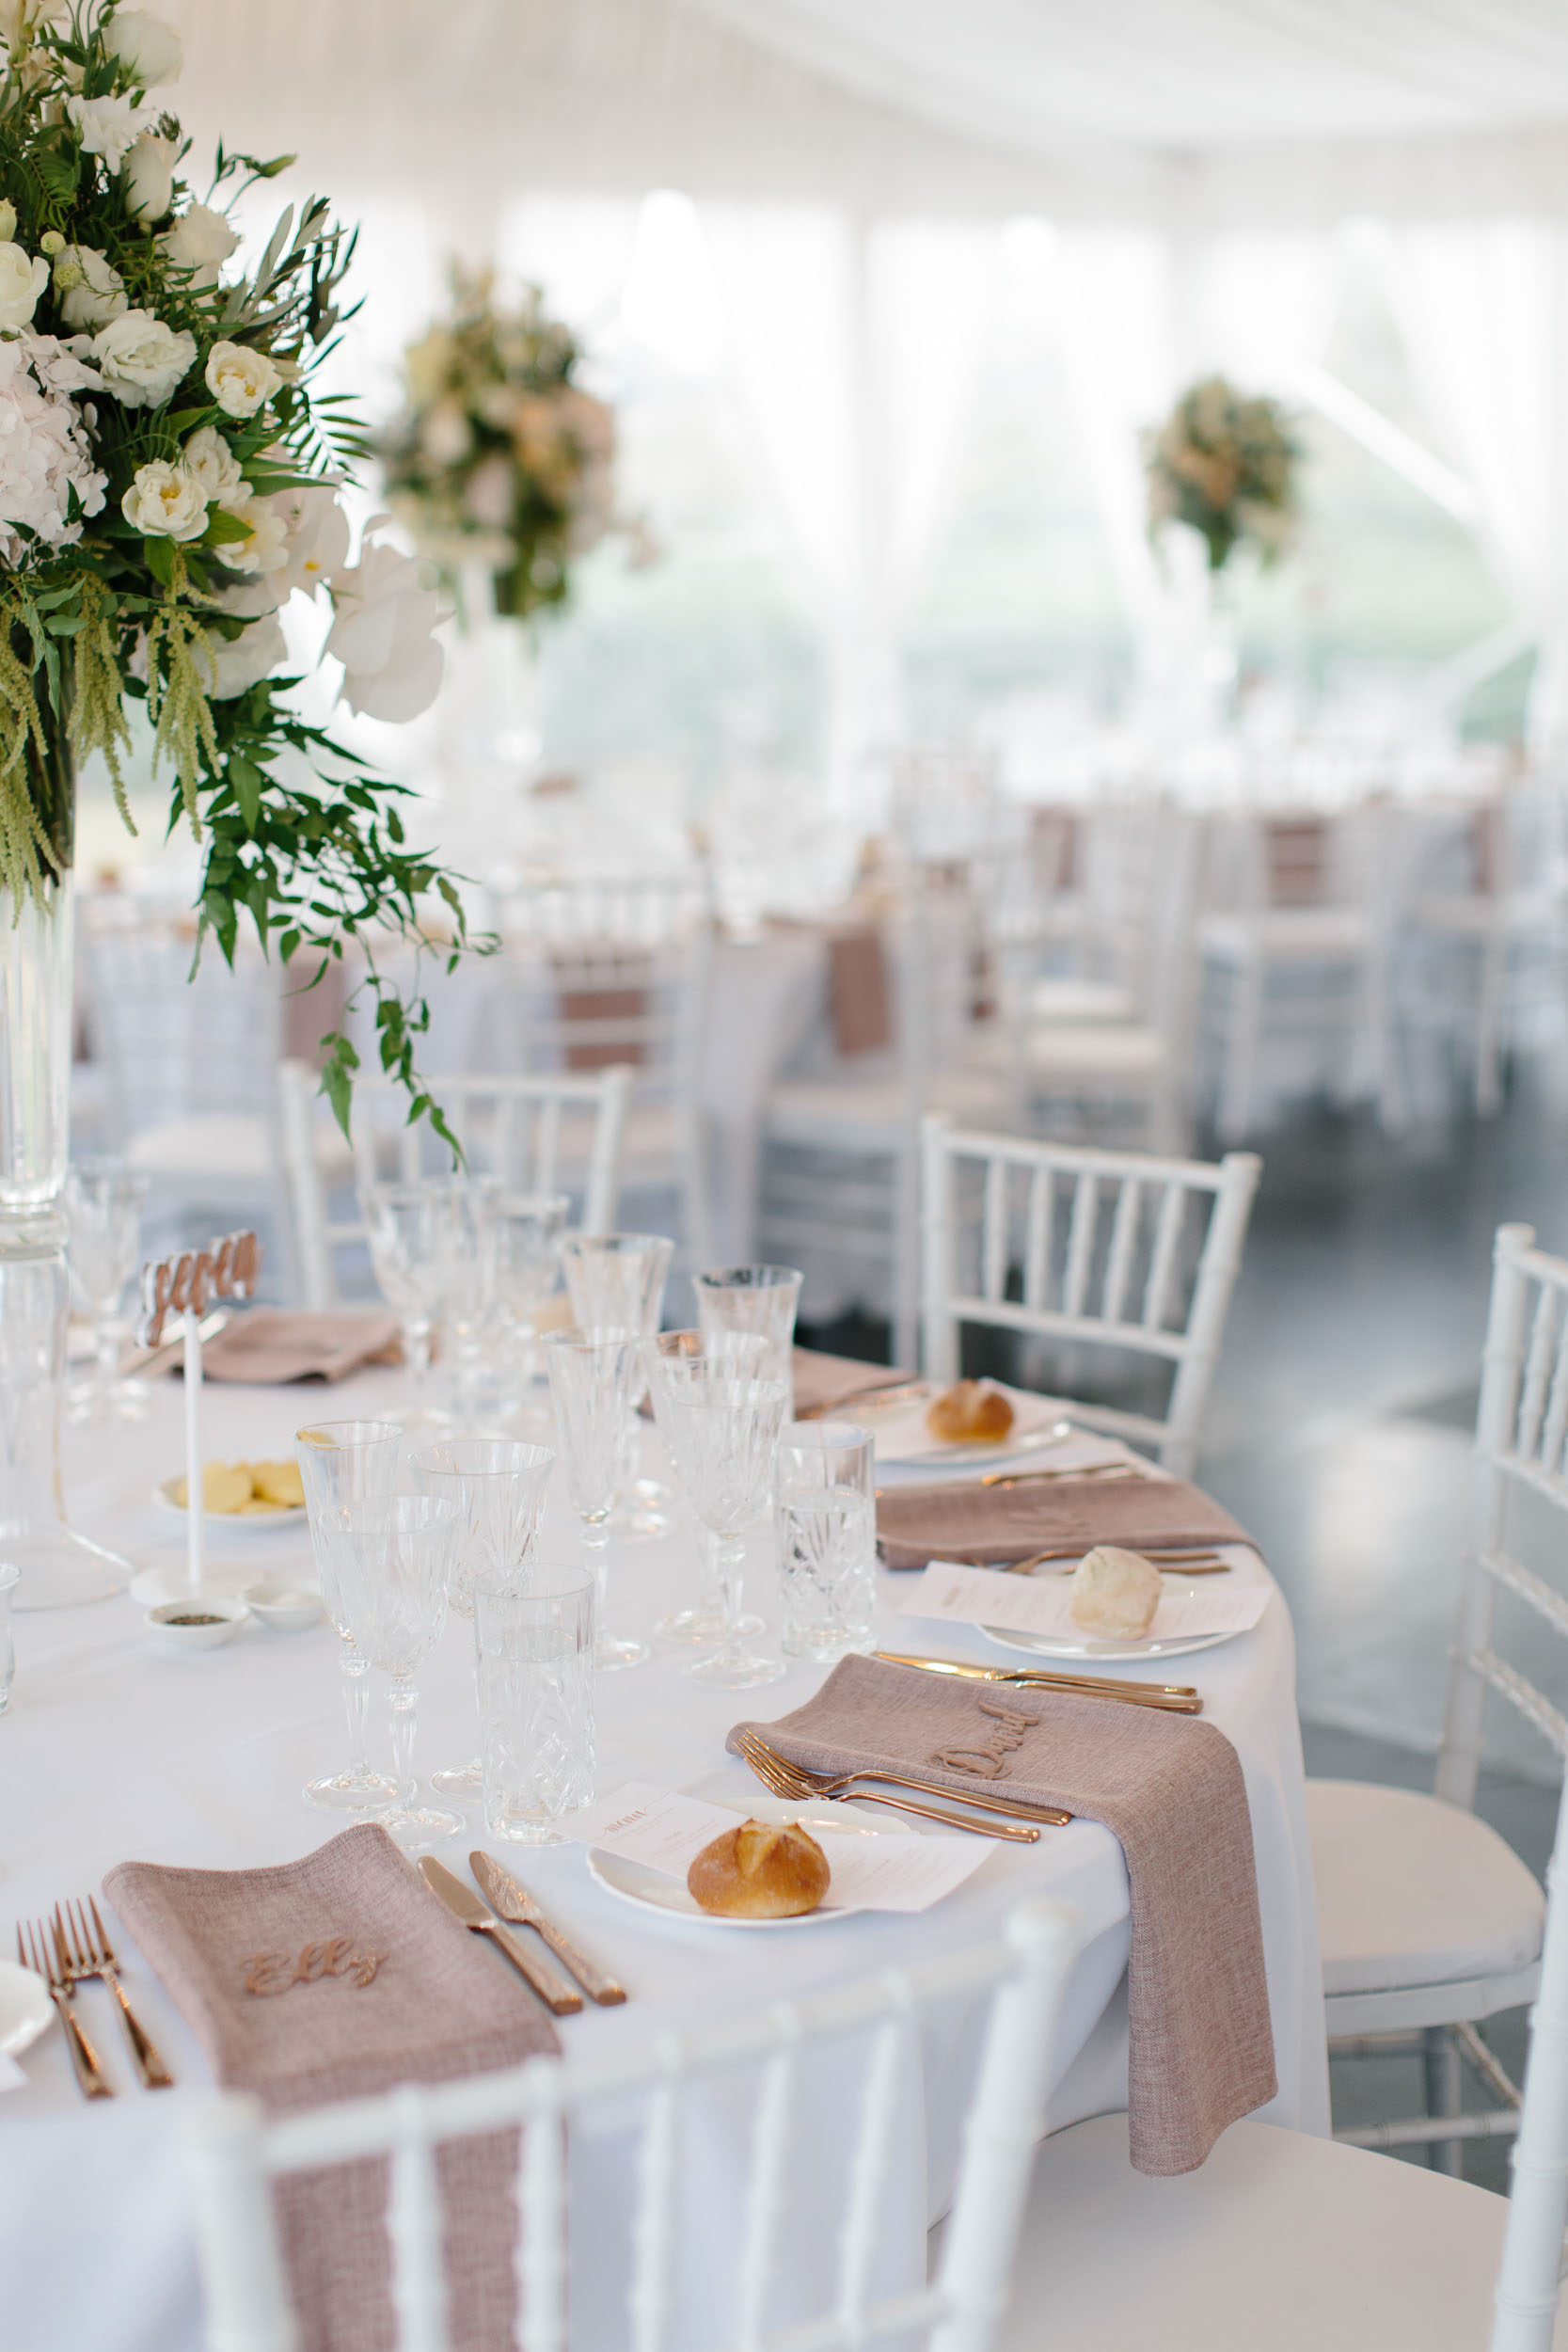 Kas-Richards-Mornington-Peninsula-Private-Property-Wedding-Marianna-Hardwick-Gown-543.jpg